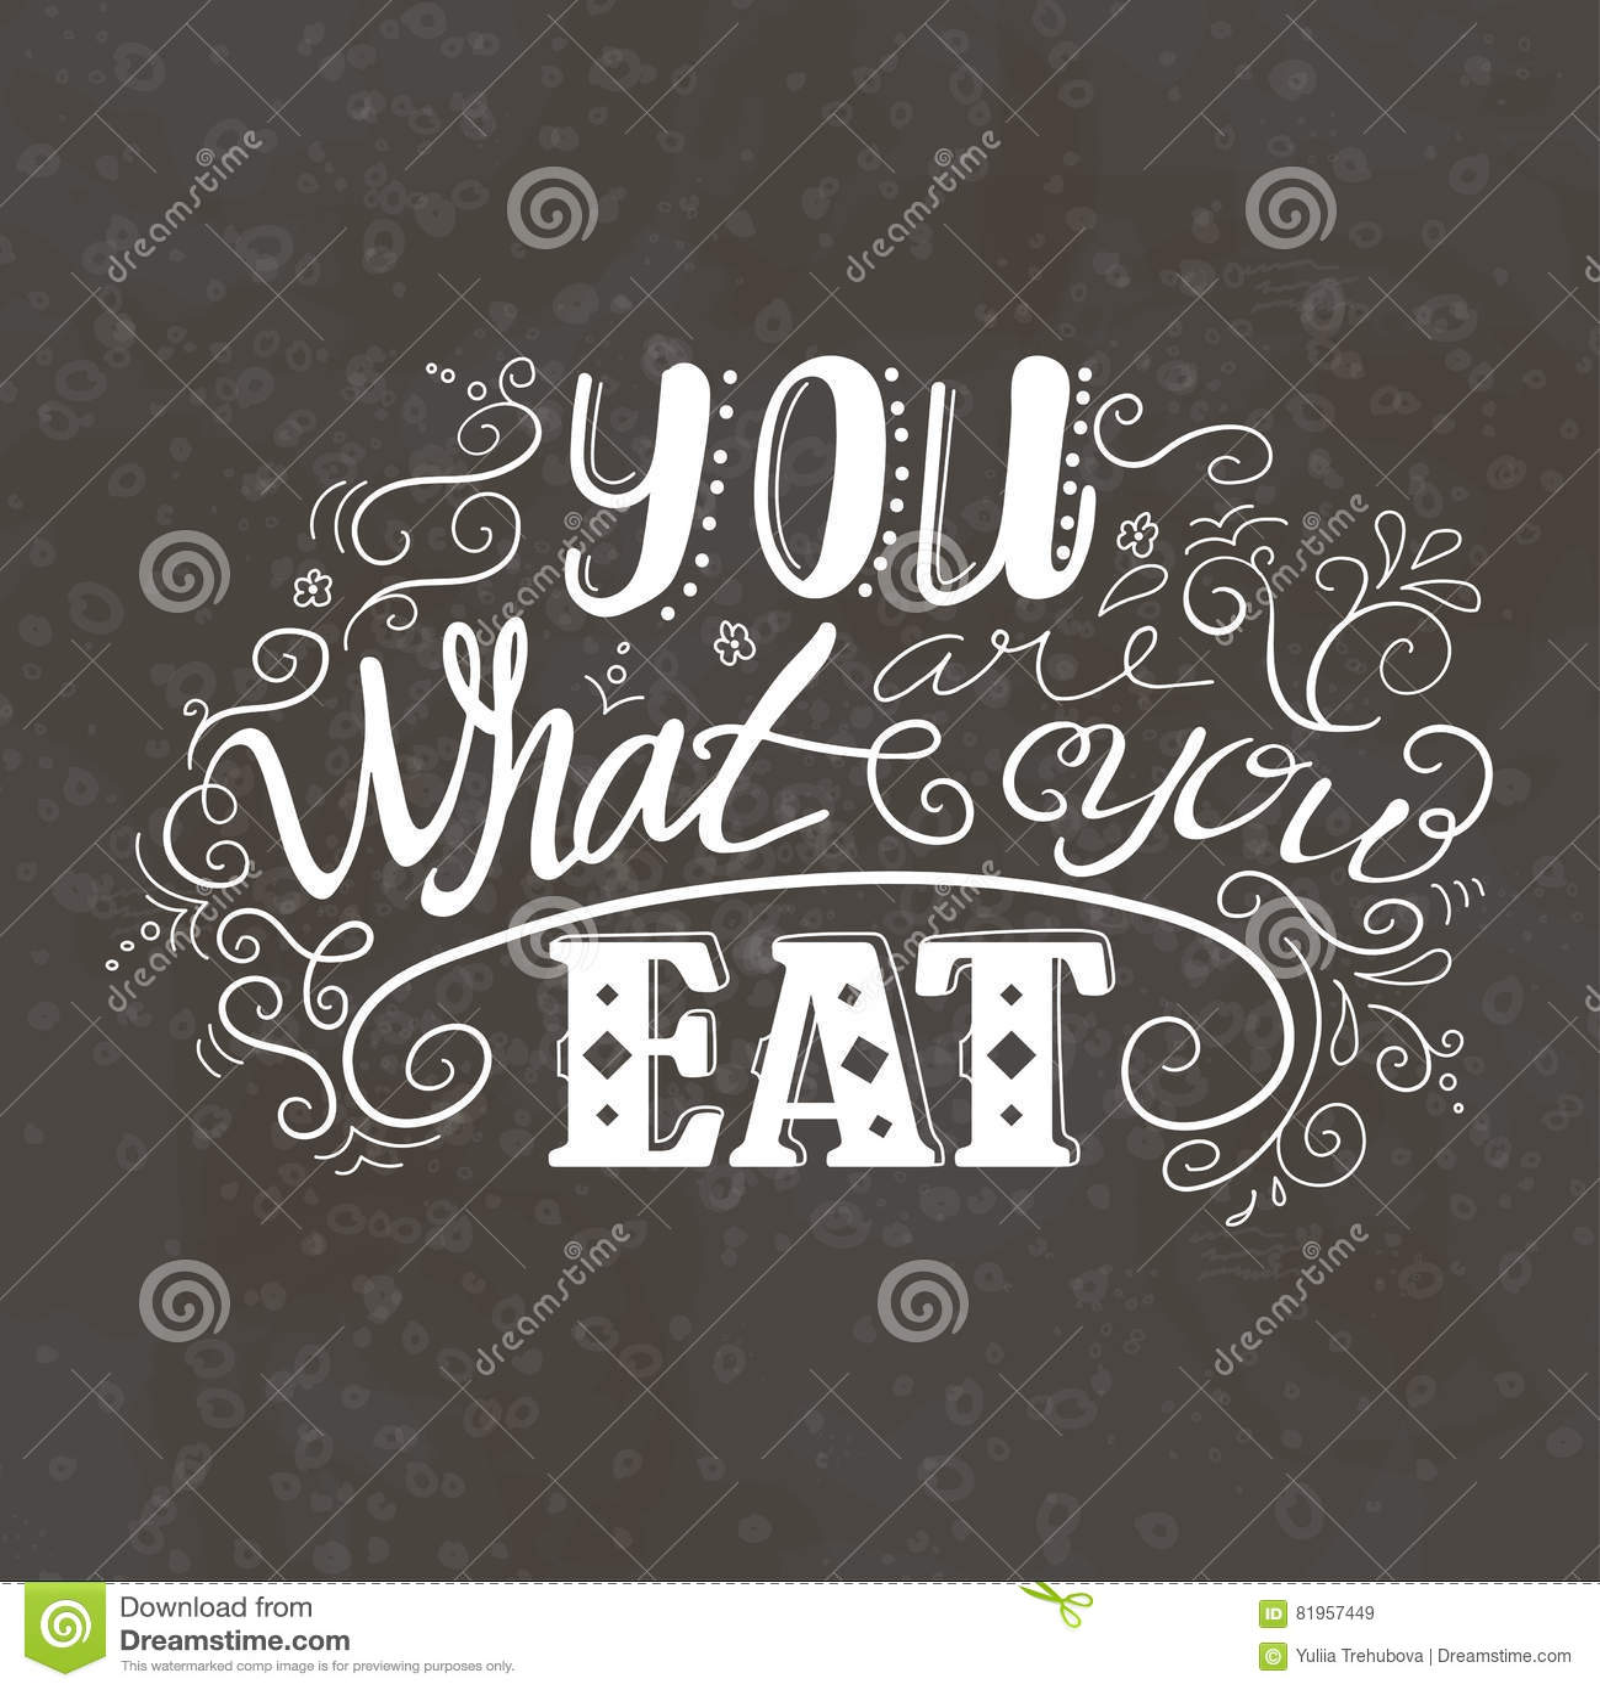 How to Create a Catchy Slogan. Top Slogan Generators ...